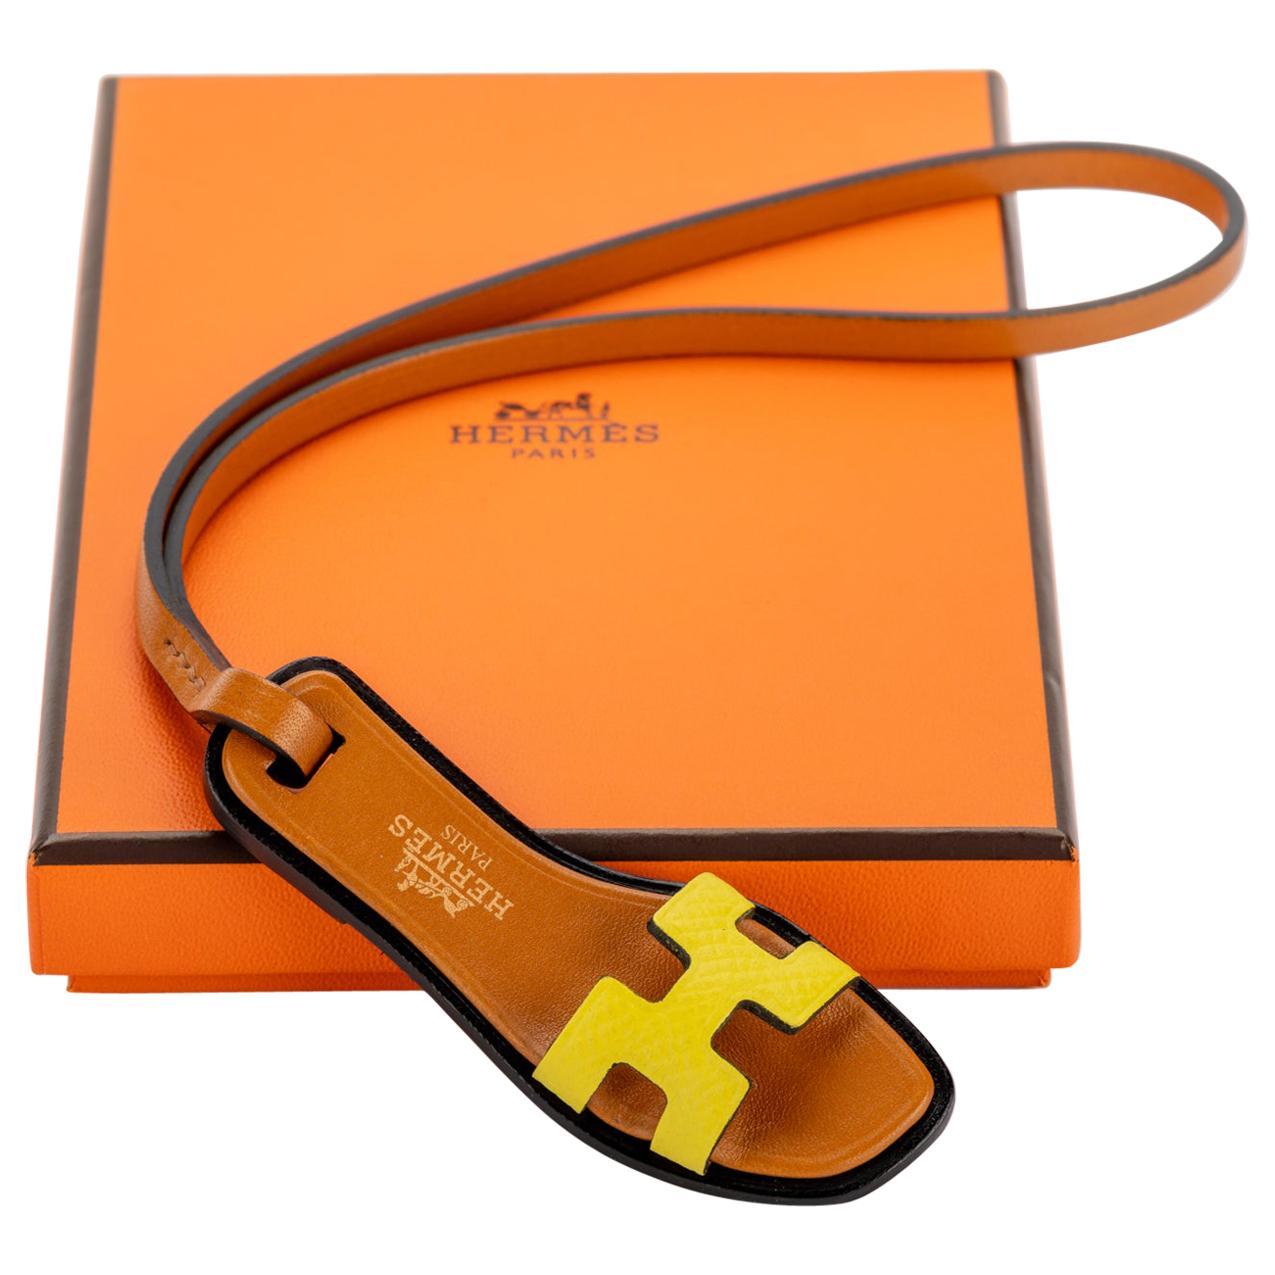 New in Box Hermes Rare Oran Yellow Bag Charm